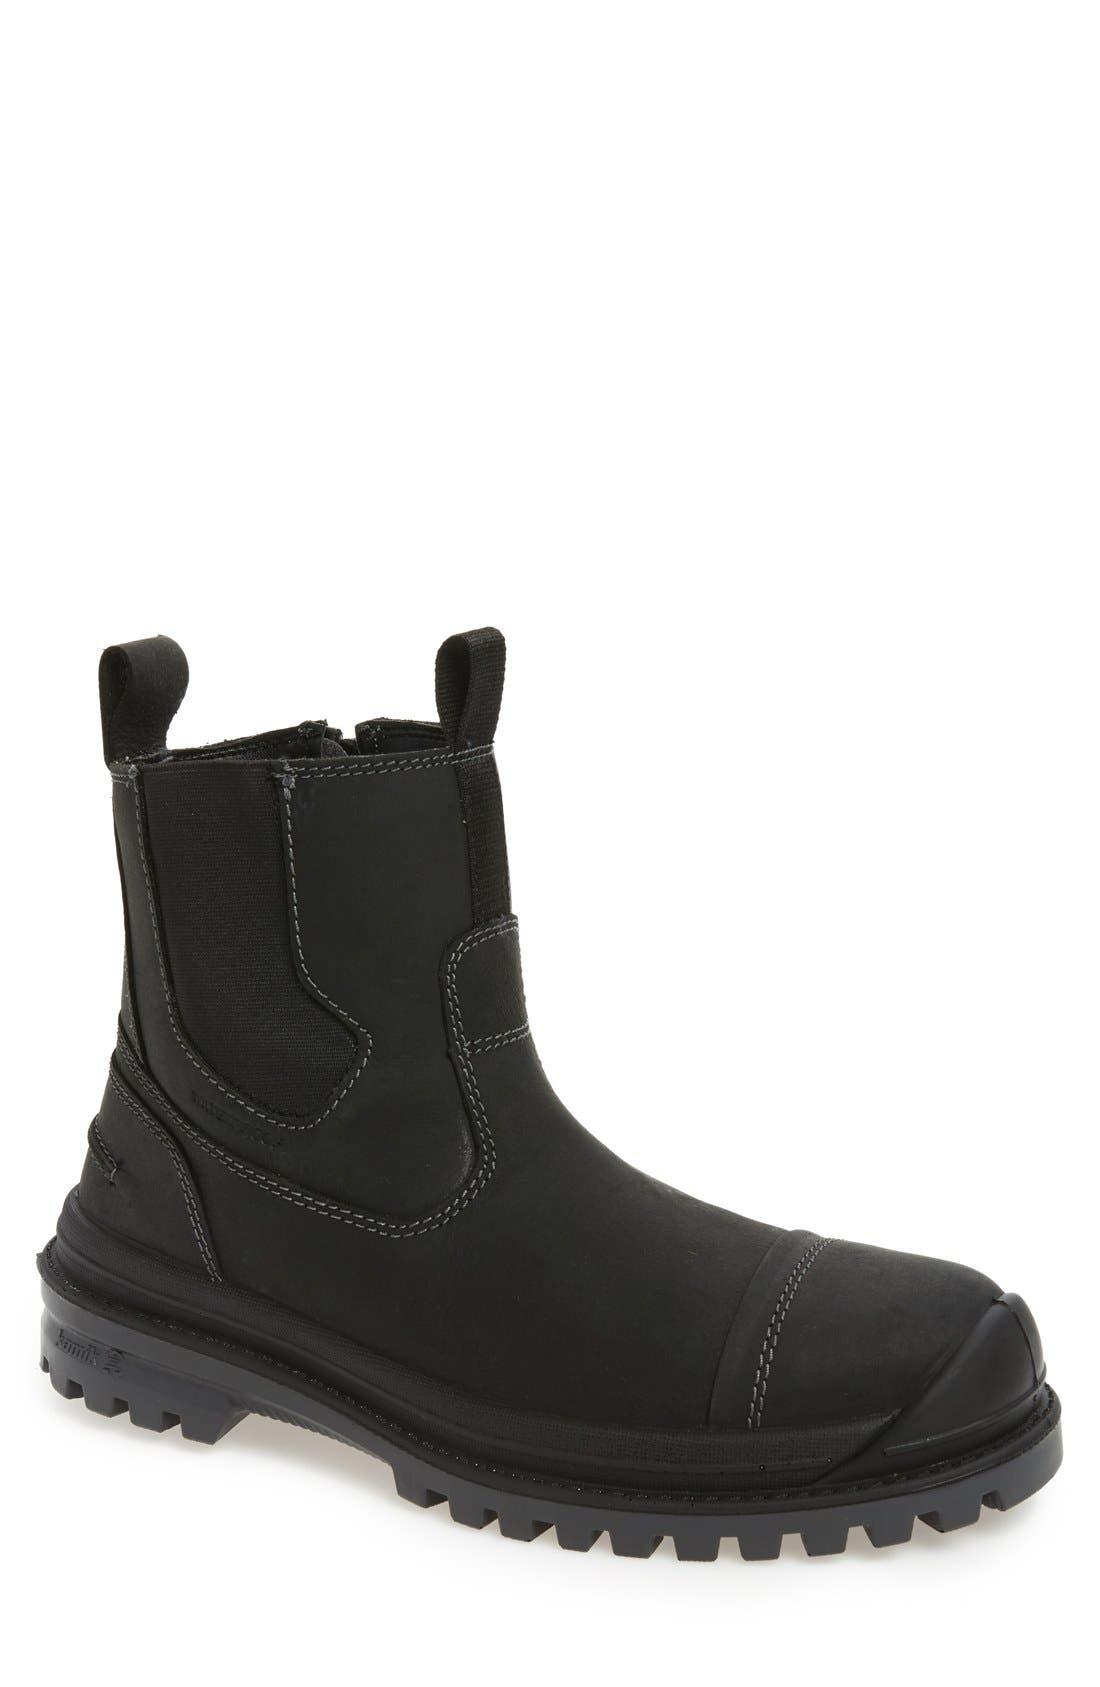 Griffon Snow Boot,                             Main thumbnail 1, color,                             Black Leather